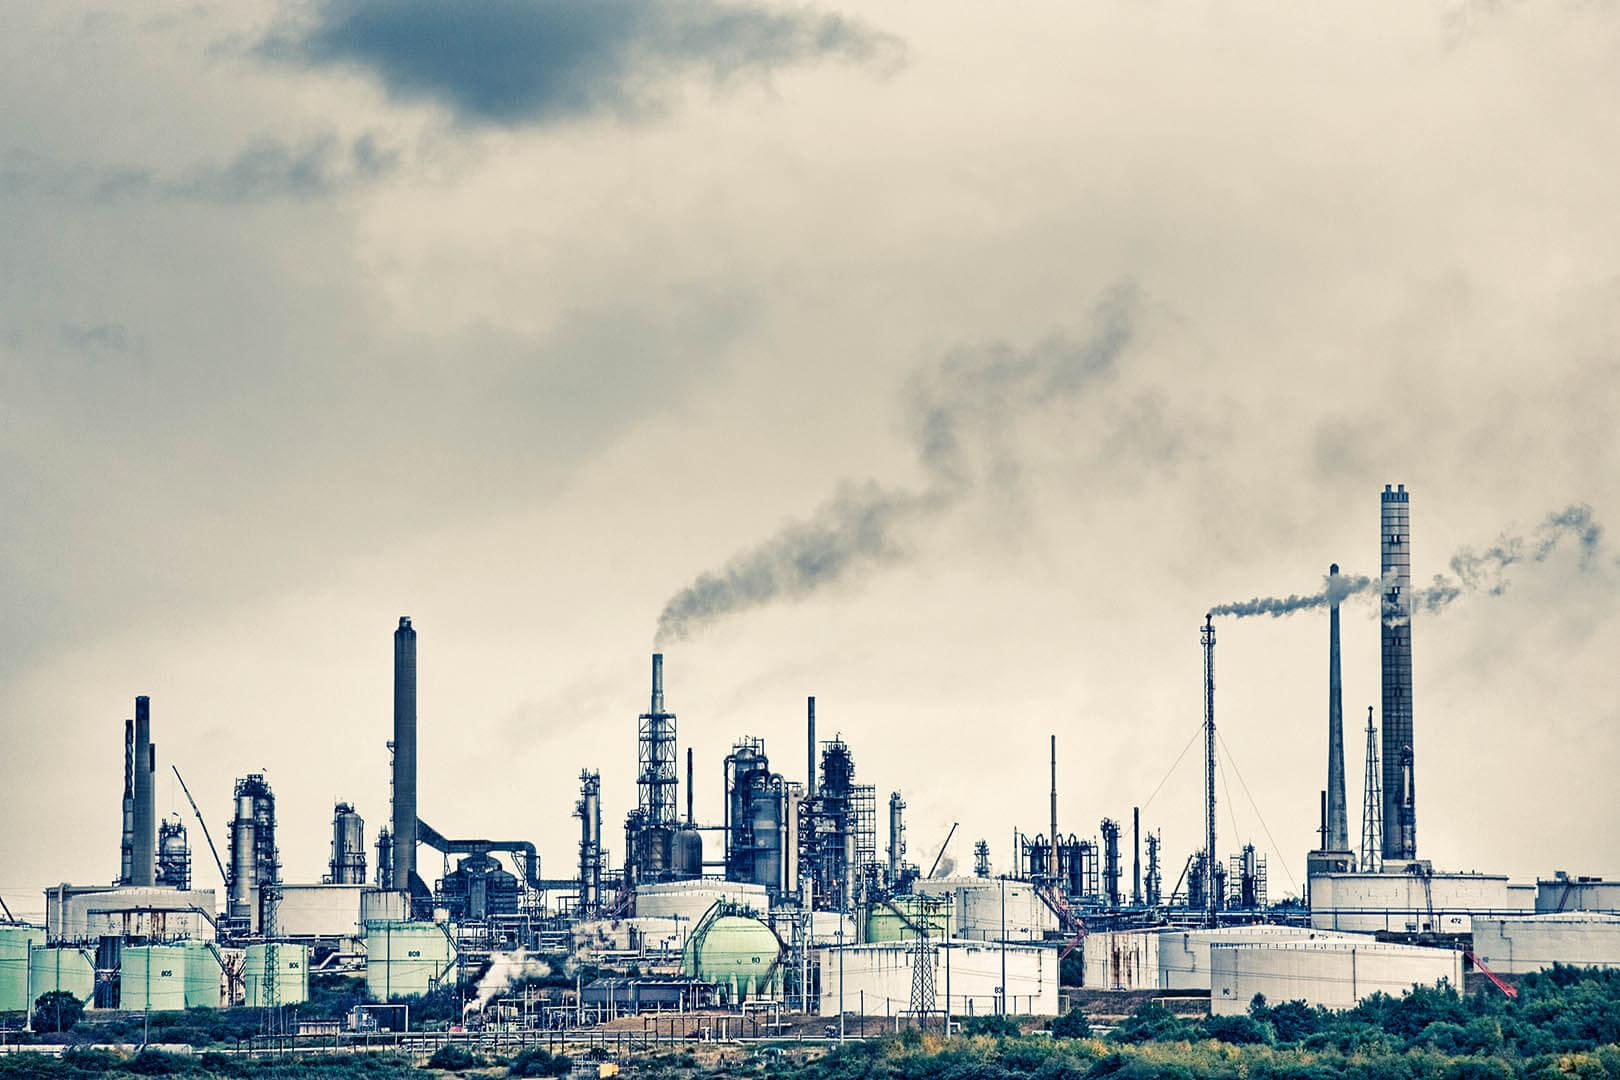 Fawley Refinery II